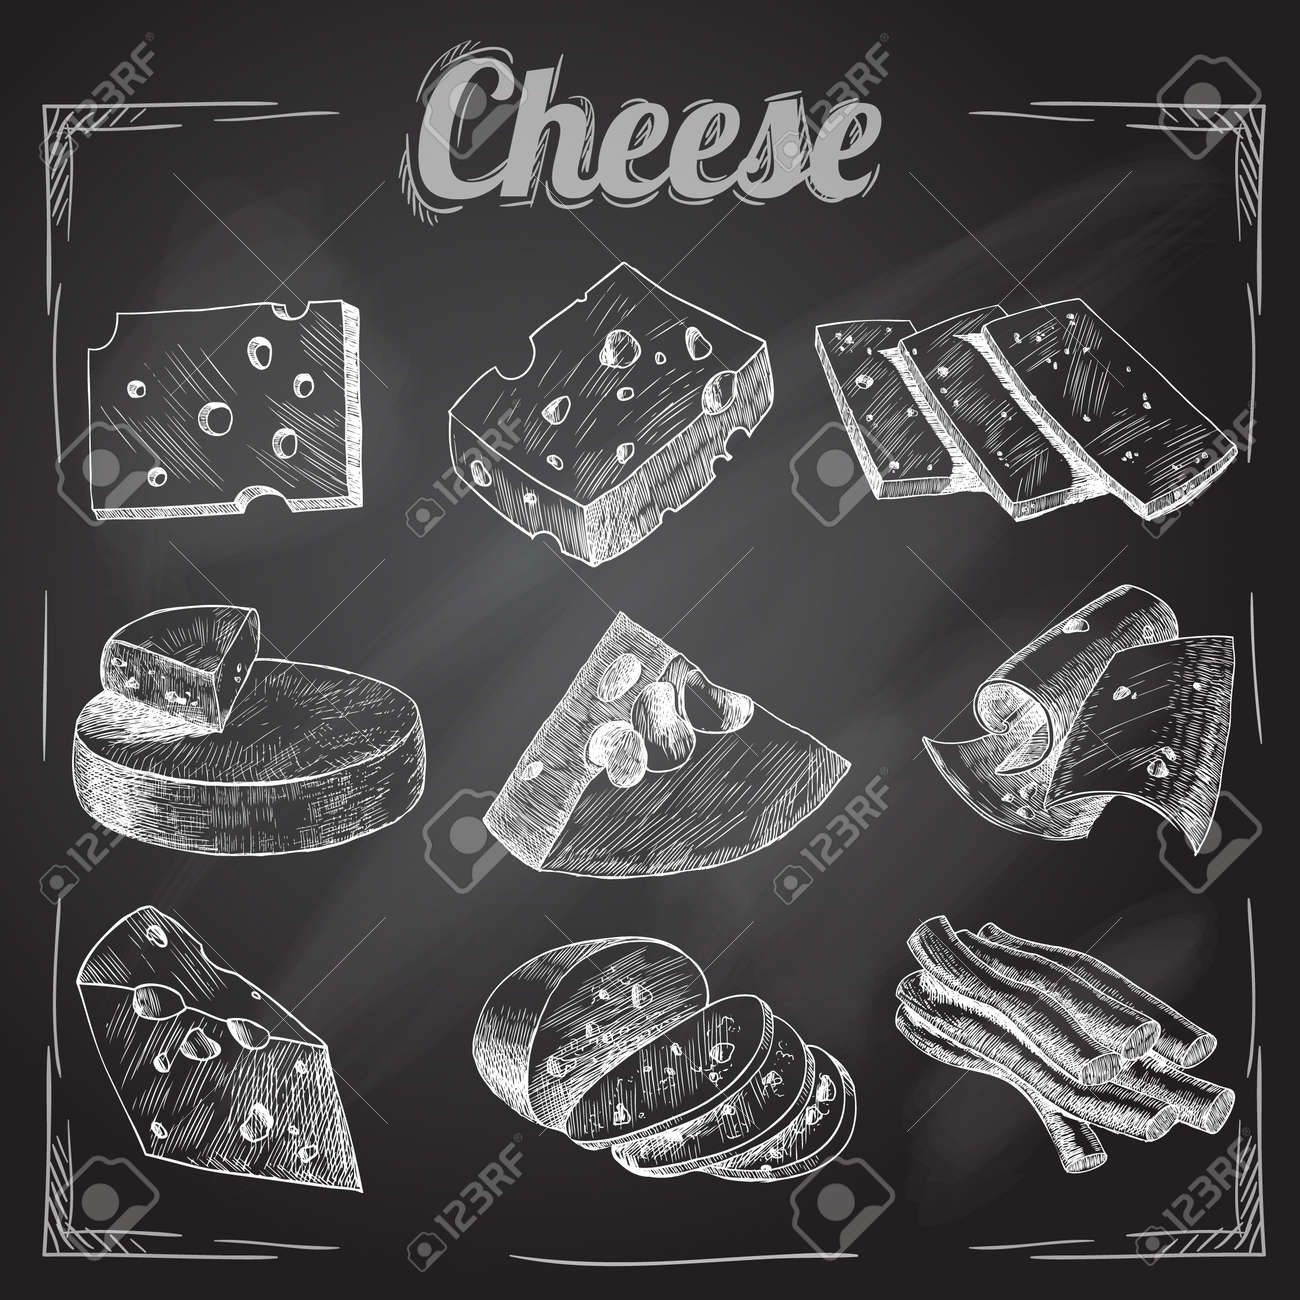 Chalk board cut sliced cheese assortment decorative icons set vector illustration - 167078811